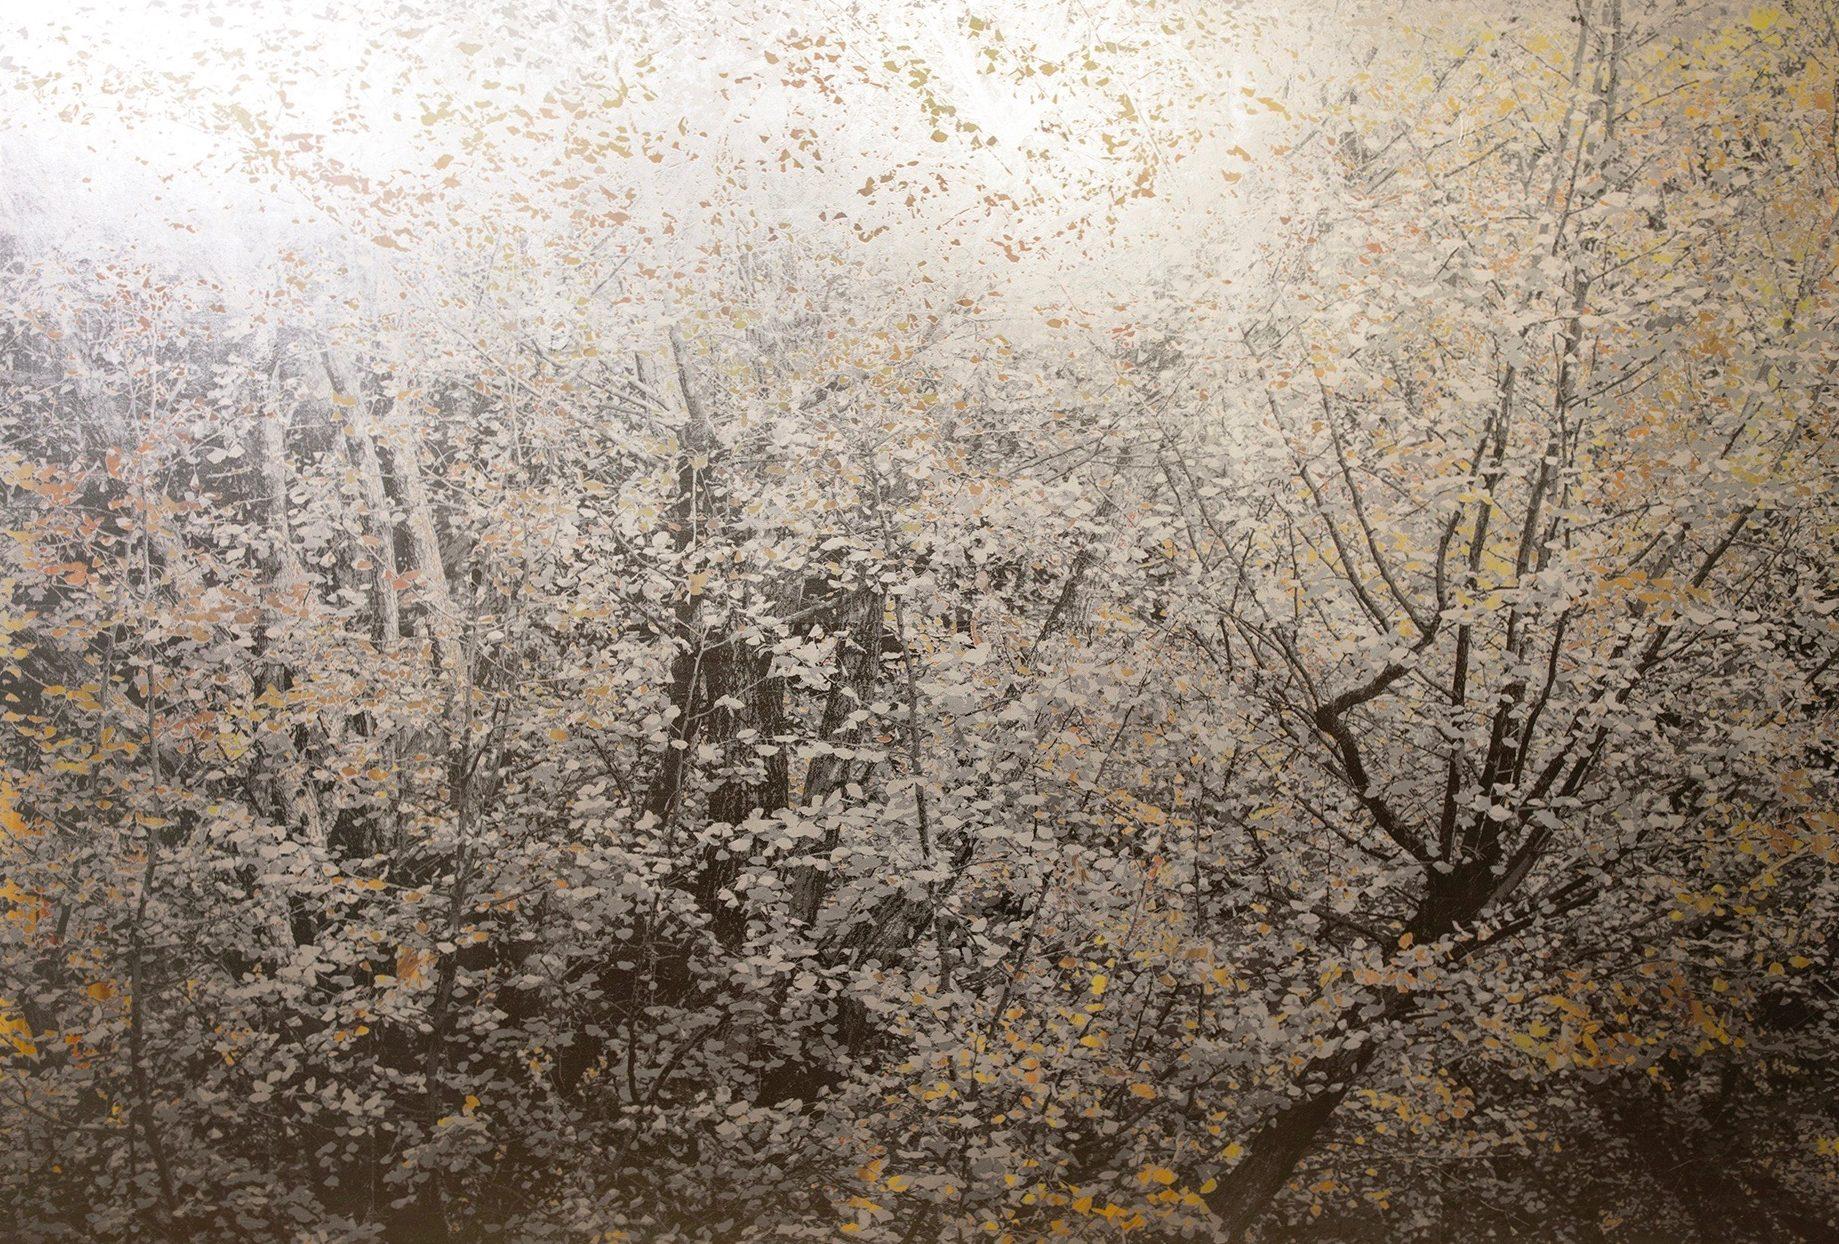 Under the Moonlight, Mirage by Masayoshi Nojo